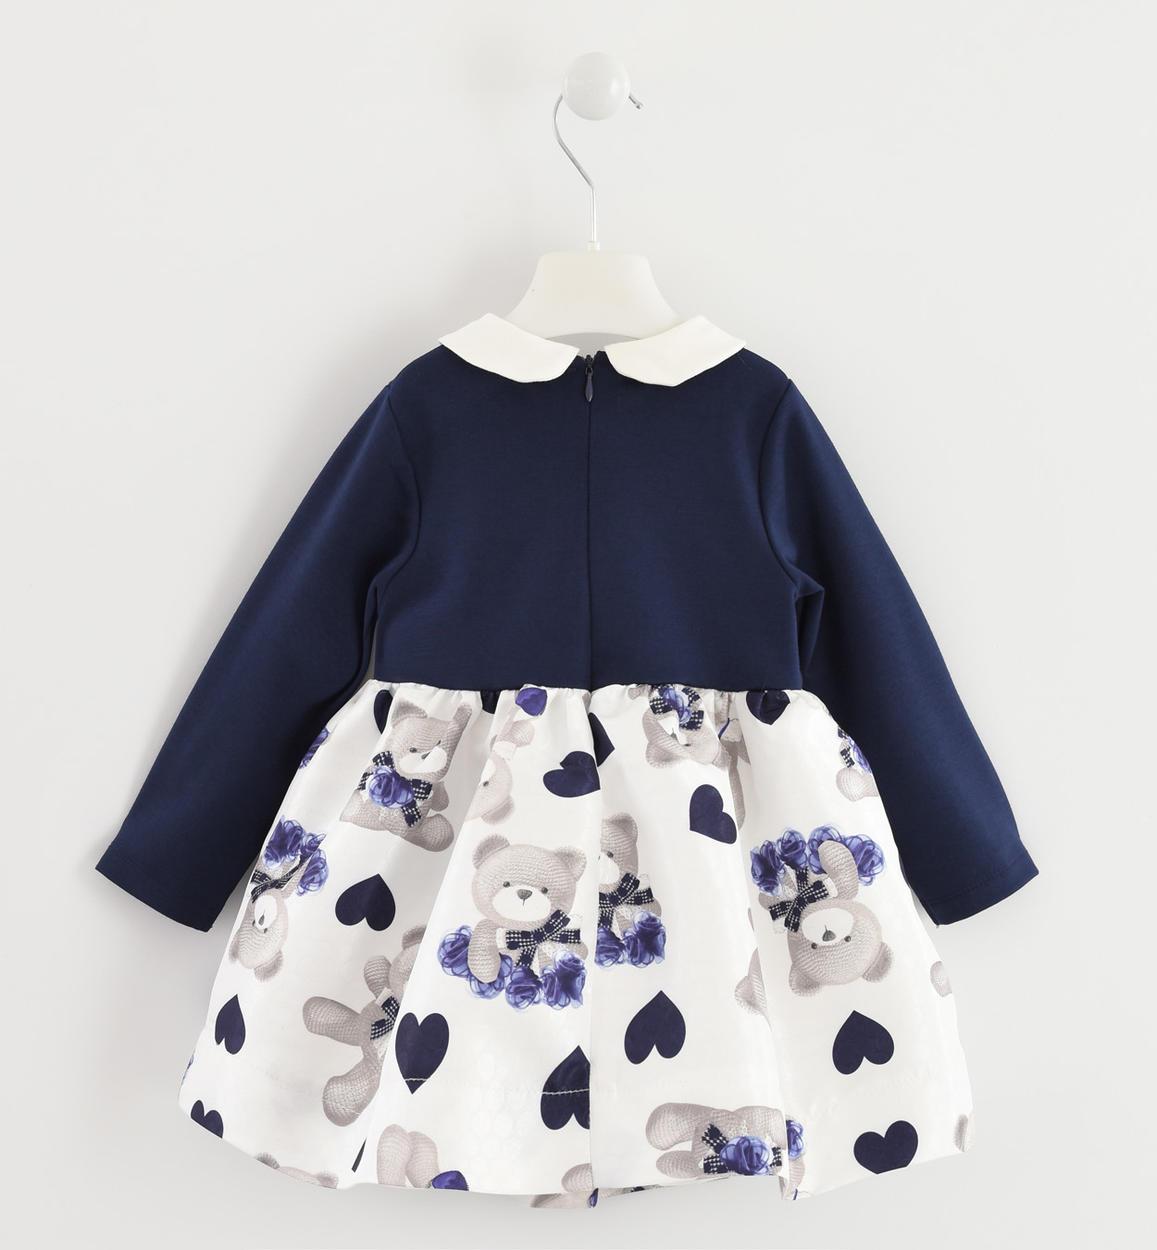 abito elegante con gonna tessuto jacquar blu retro 02 1444k65400 8134 150x150